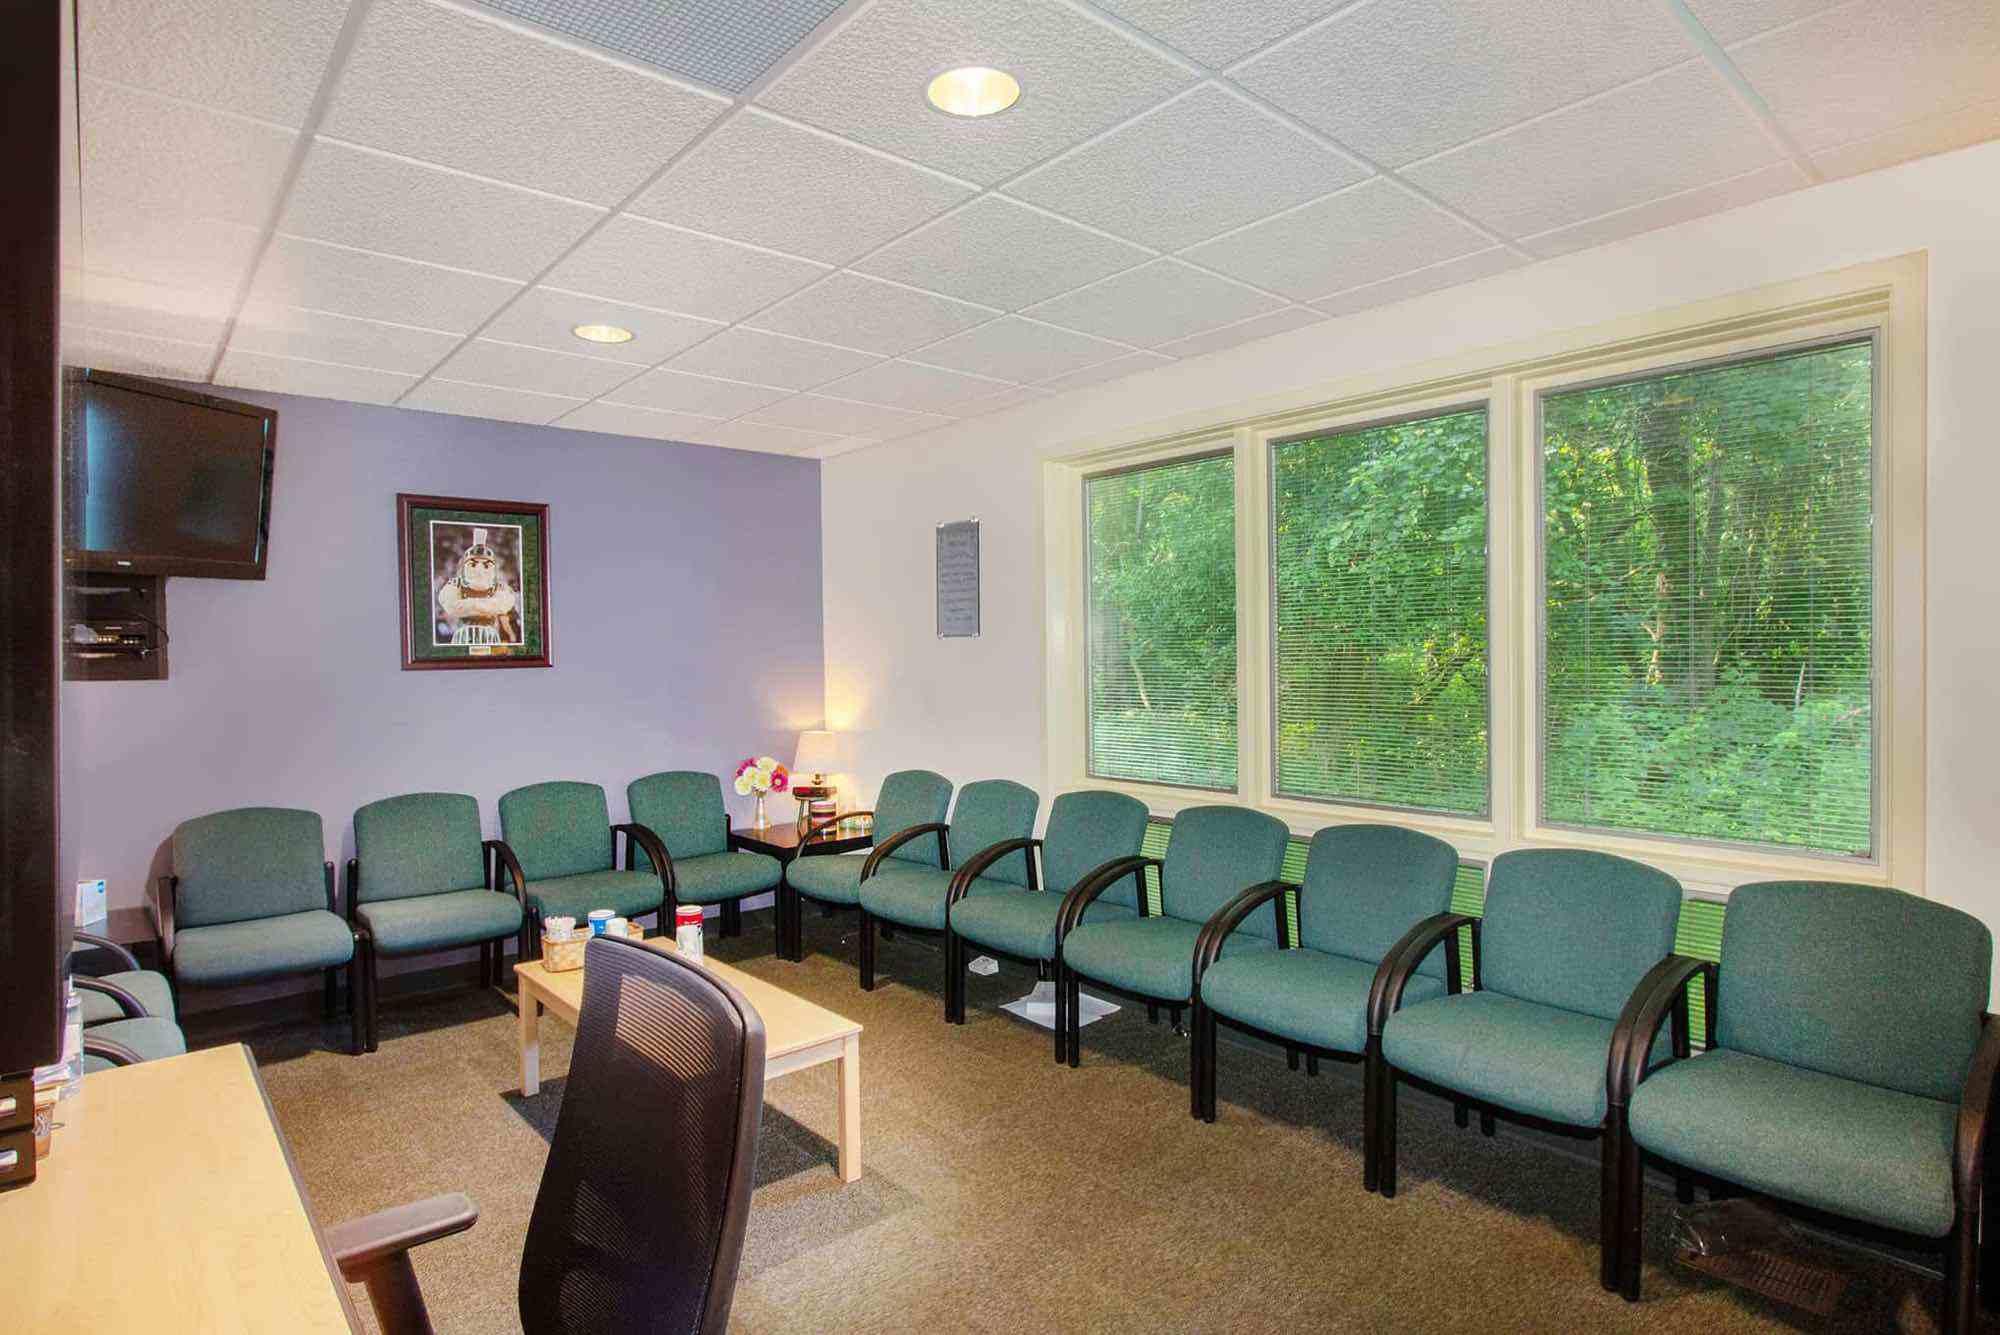 Kalamazoo Clinic | Pine Rest Christian Mental Health Services